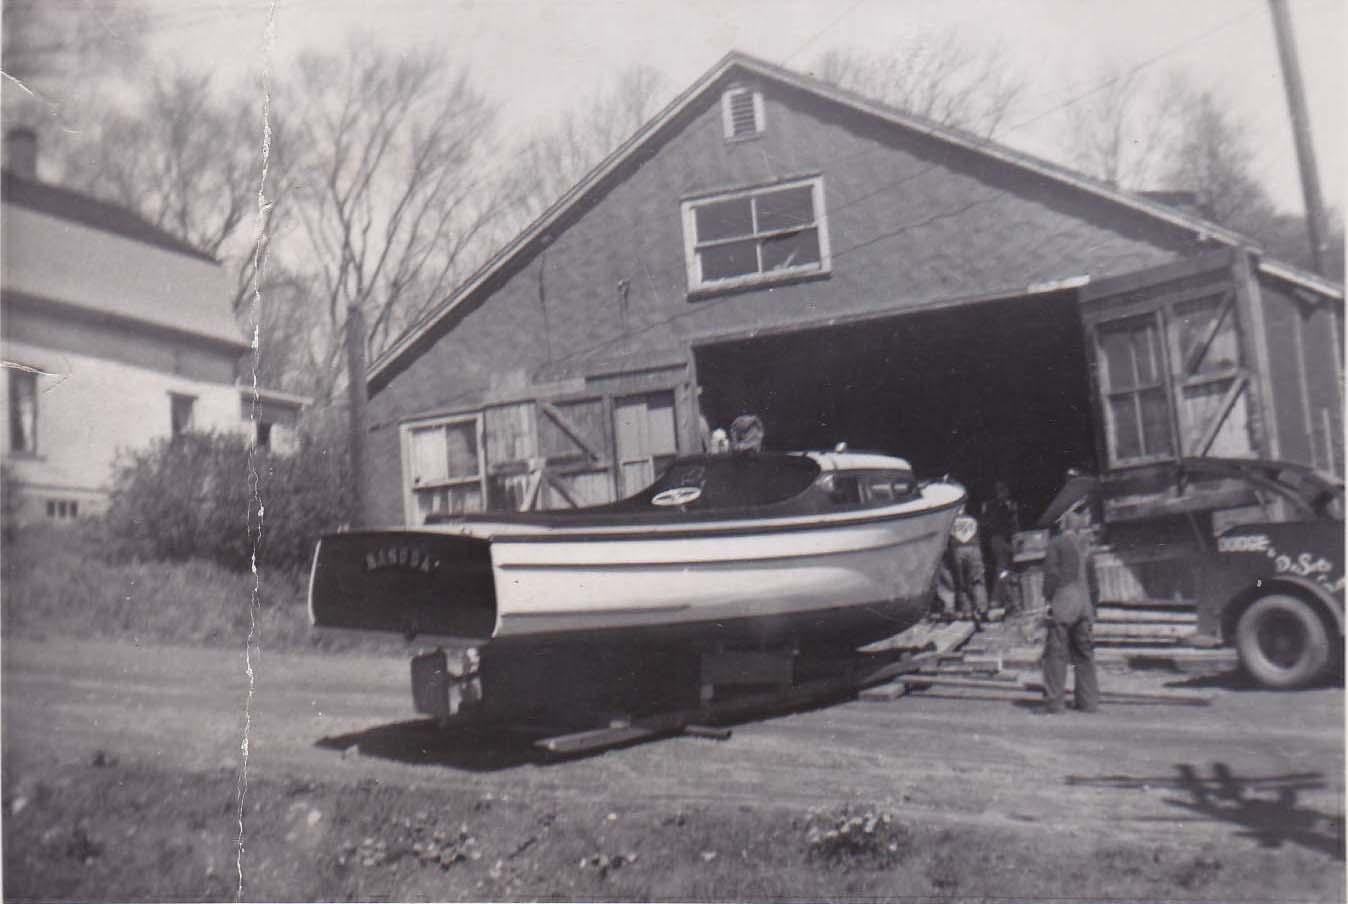 52_boat6 (1).jpg